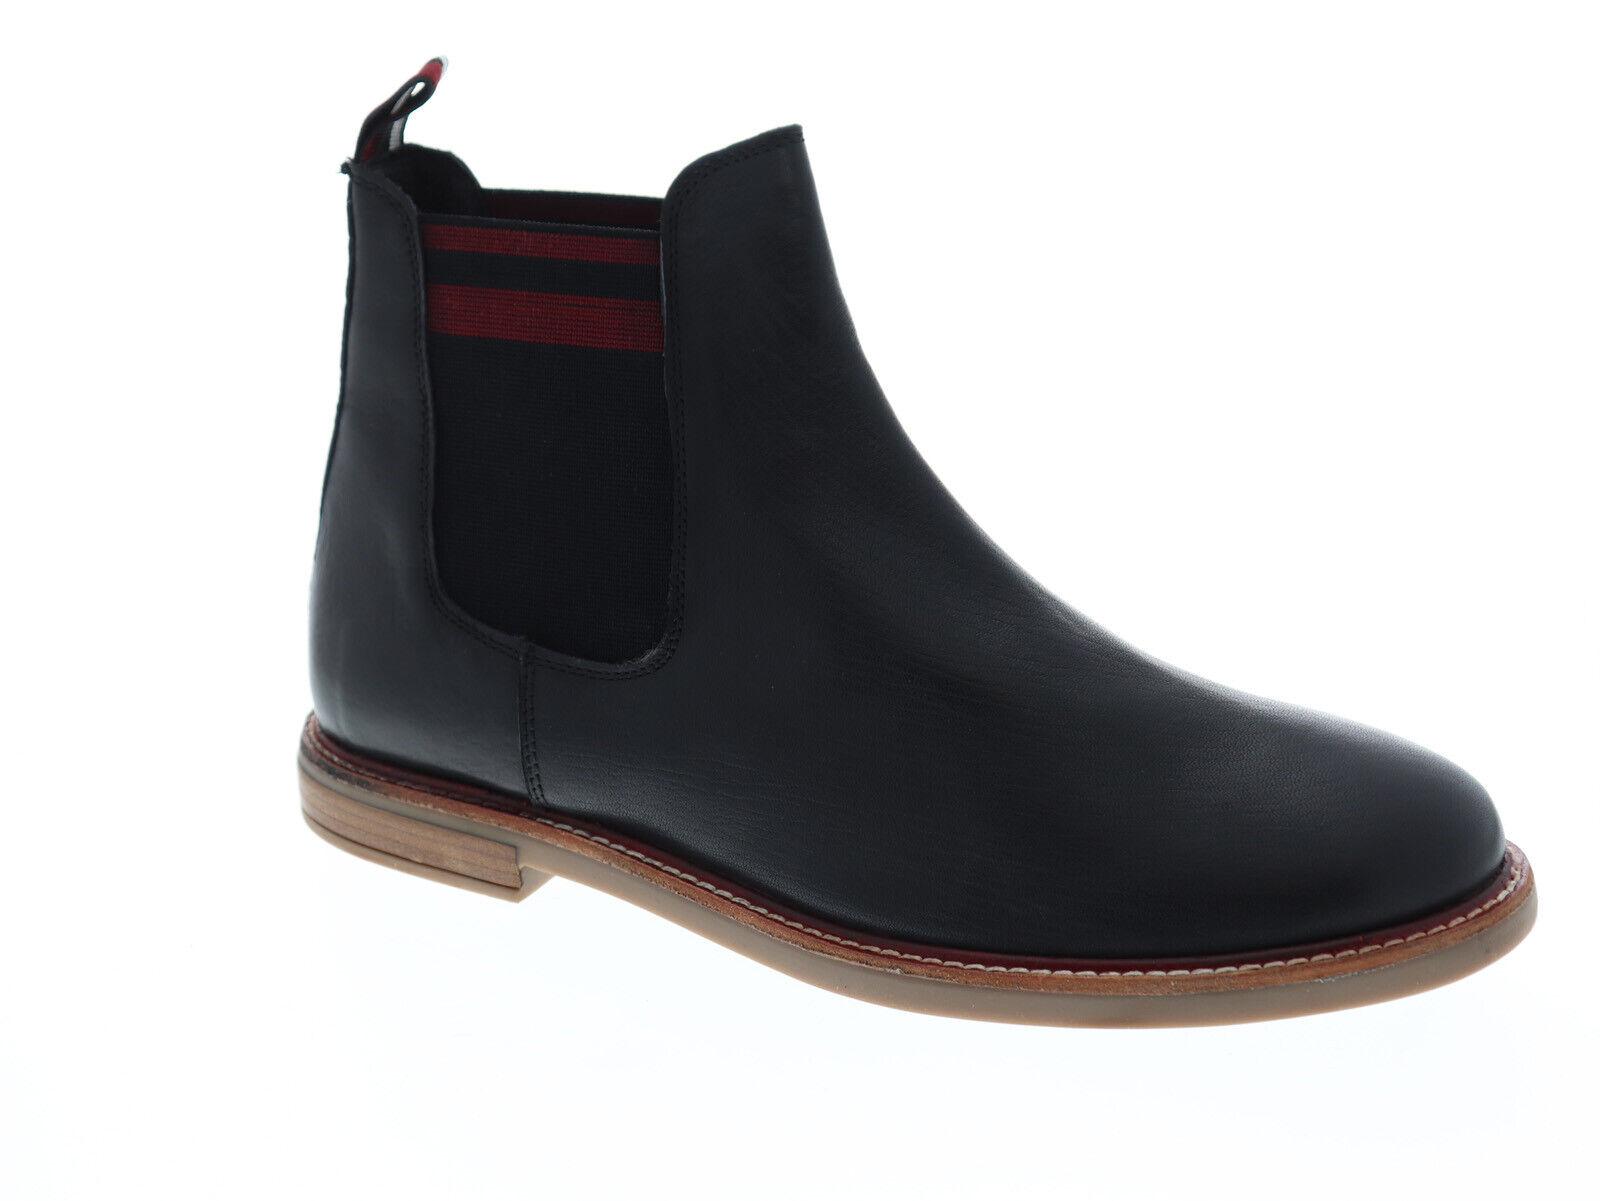 Ben Sherman Birk Chelsea BNM00055 Mens Black Leather Slip On Boots Shoes